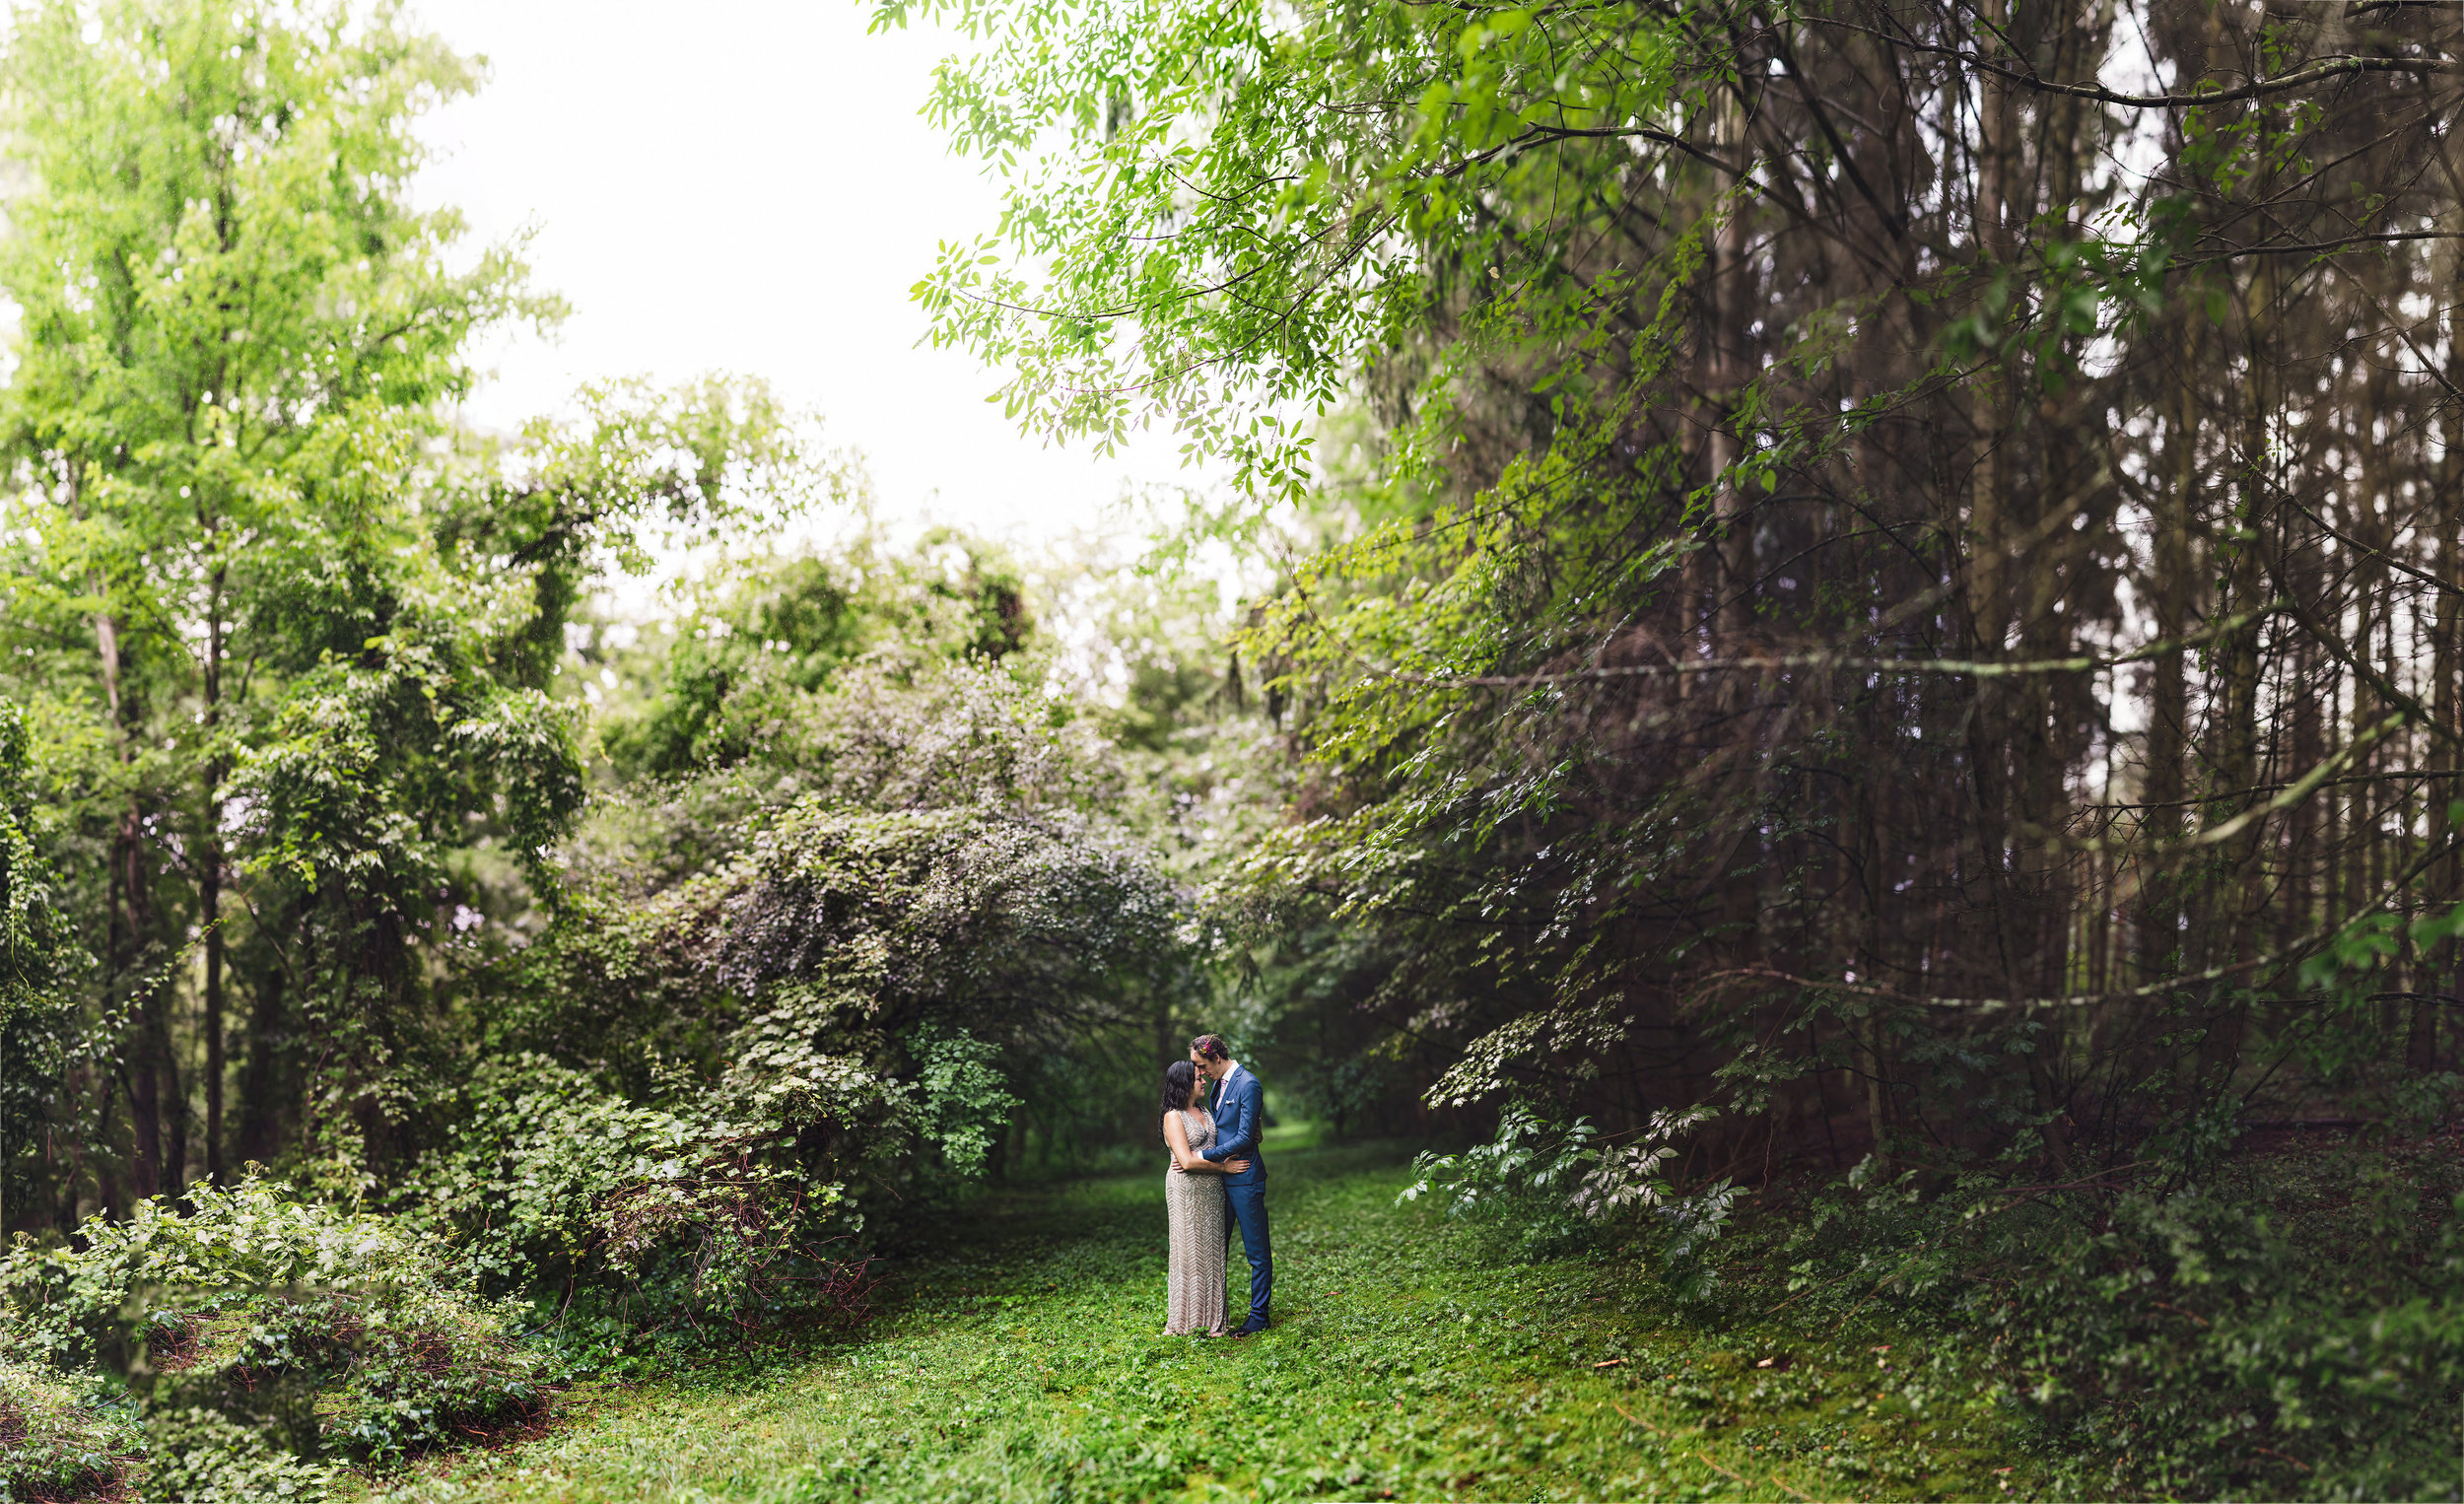 upstate-ny-wedding-jove-meyer-events-inbal-sivan-090.JPG